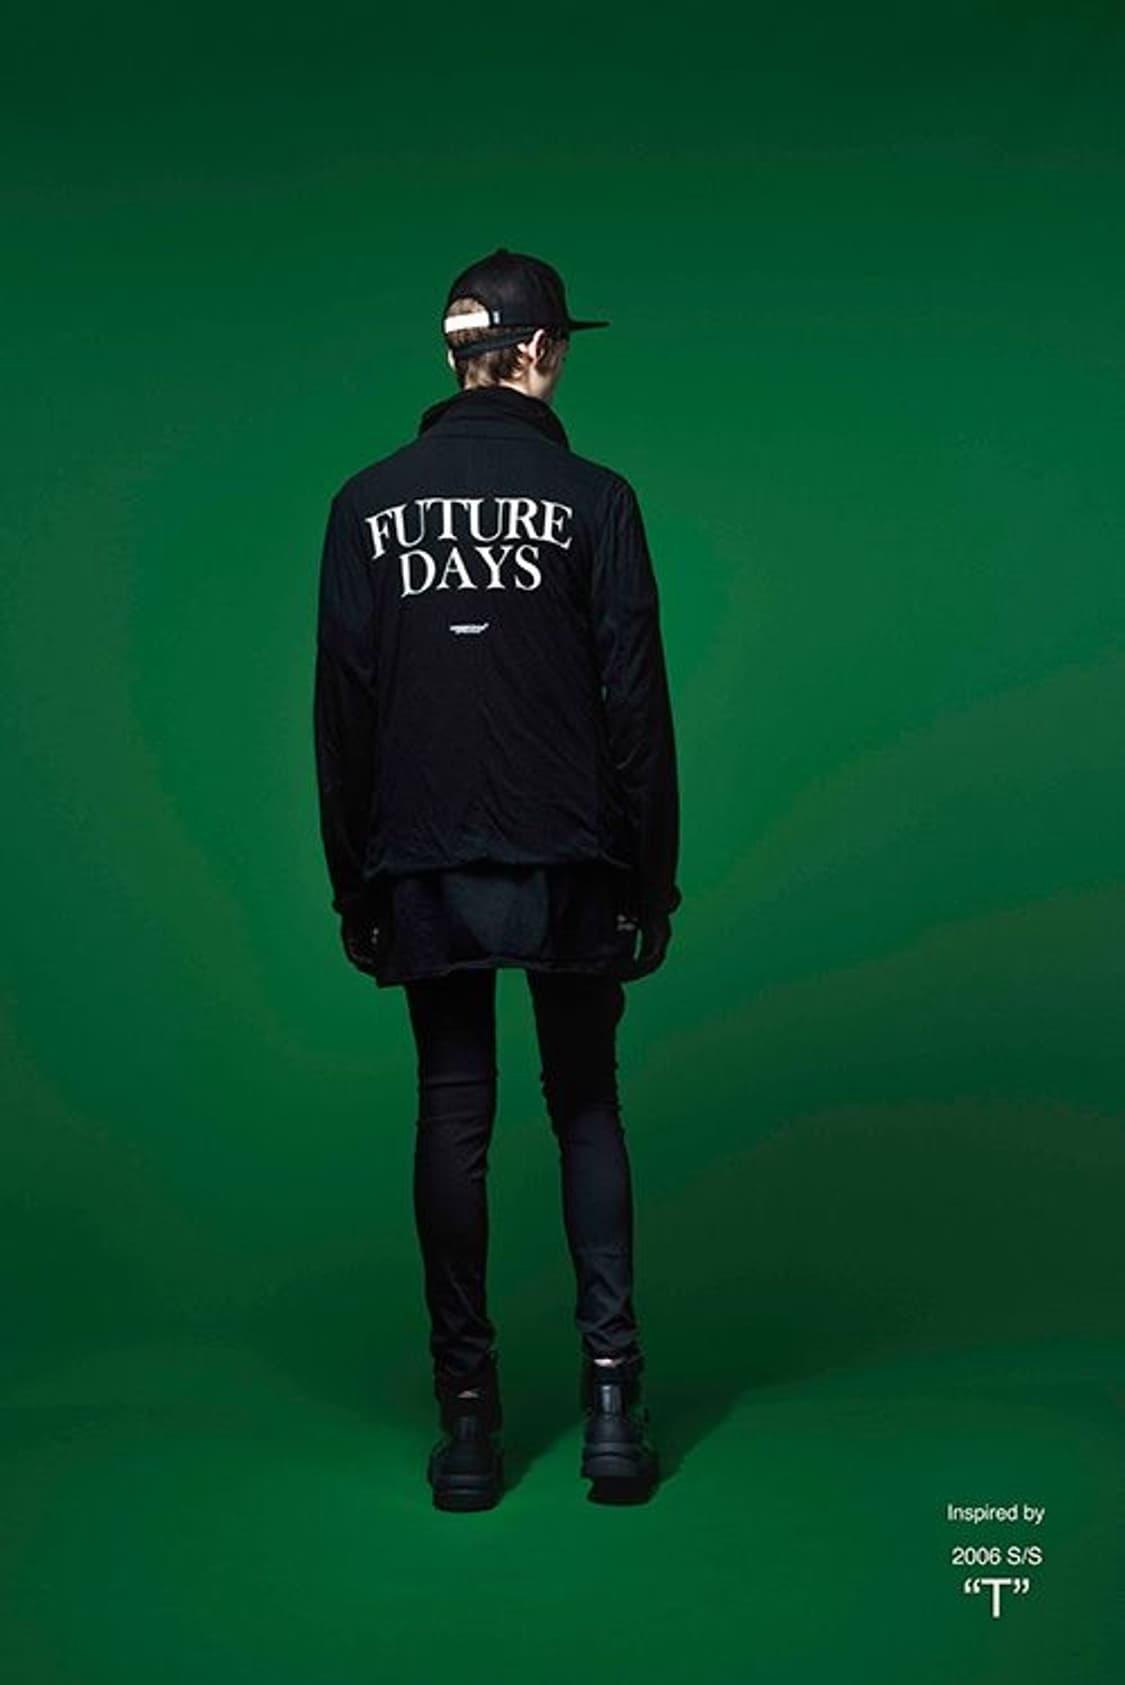 undercover future days